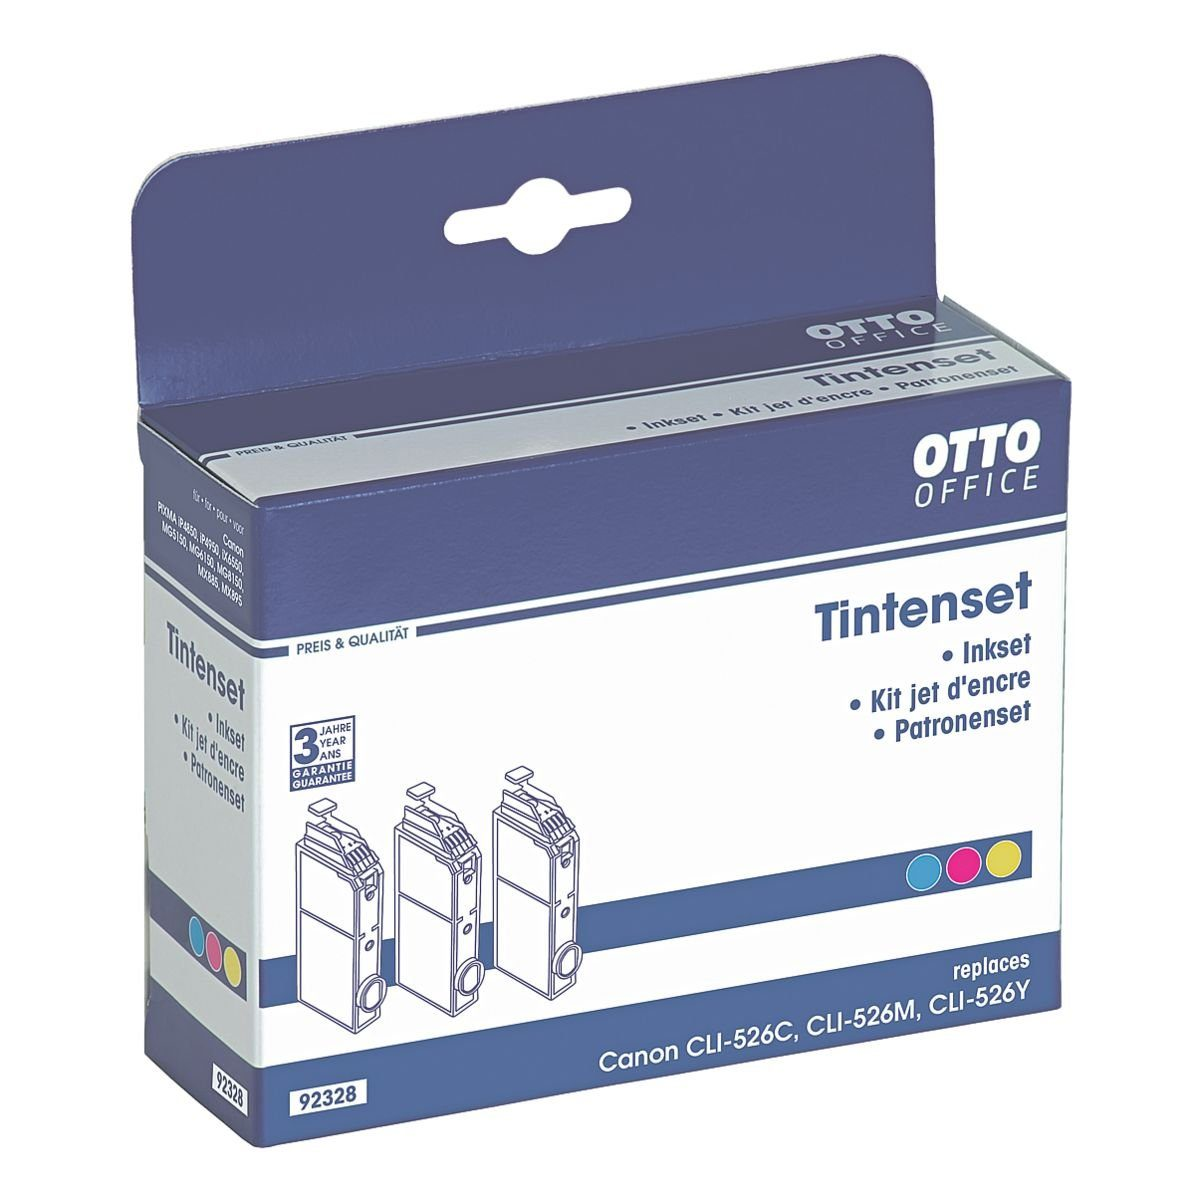 OTTO Office Standard Tintenpatronen-Set ersetzt Canon »CLI-526CMY«